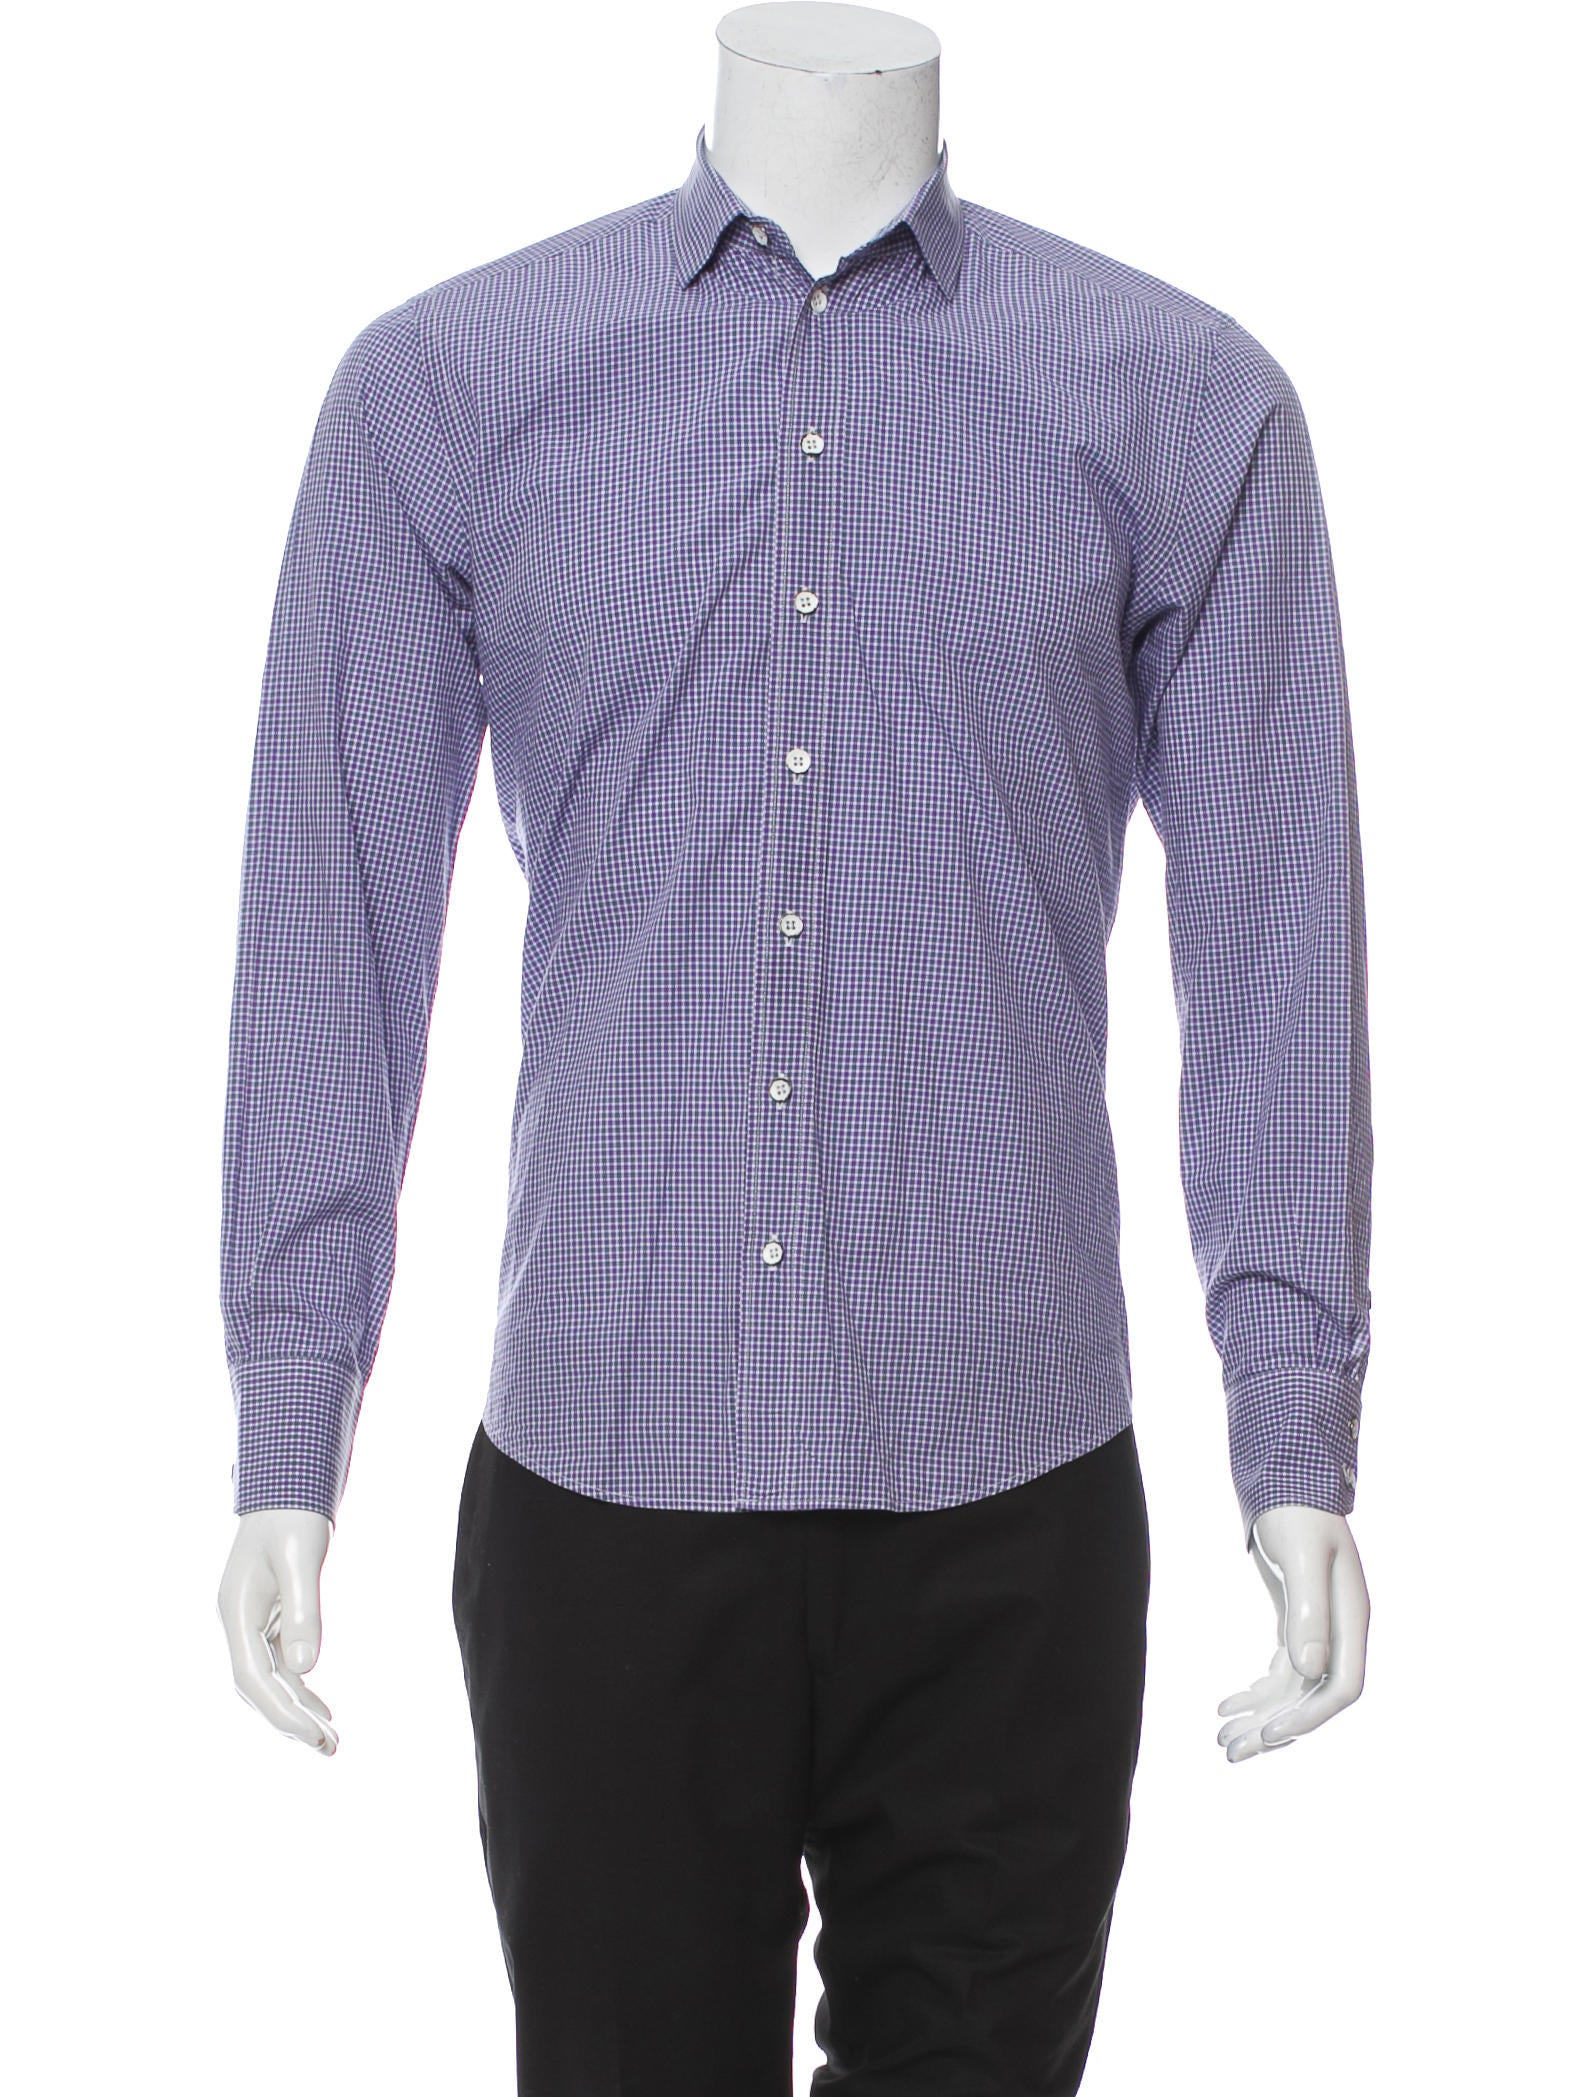 Rag Bone Check Woven Shirt Clothing Wragb85046 The